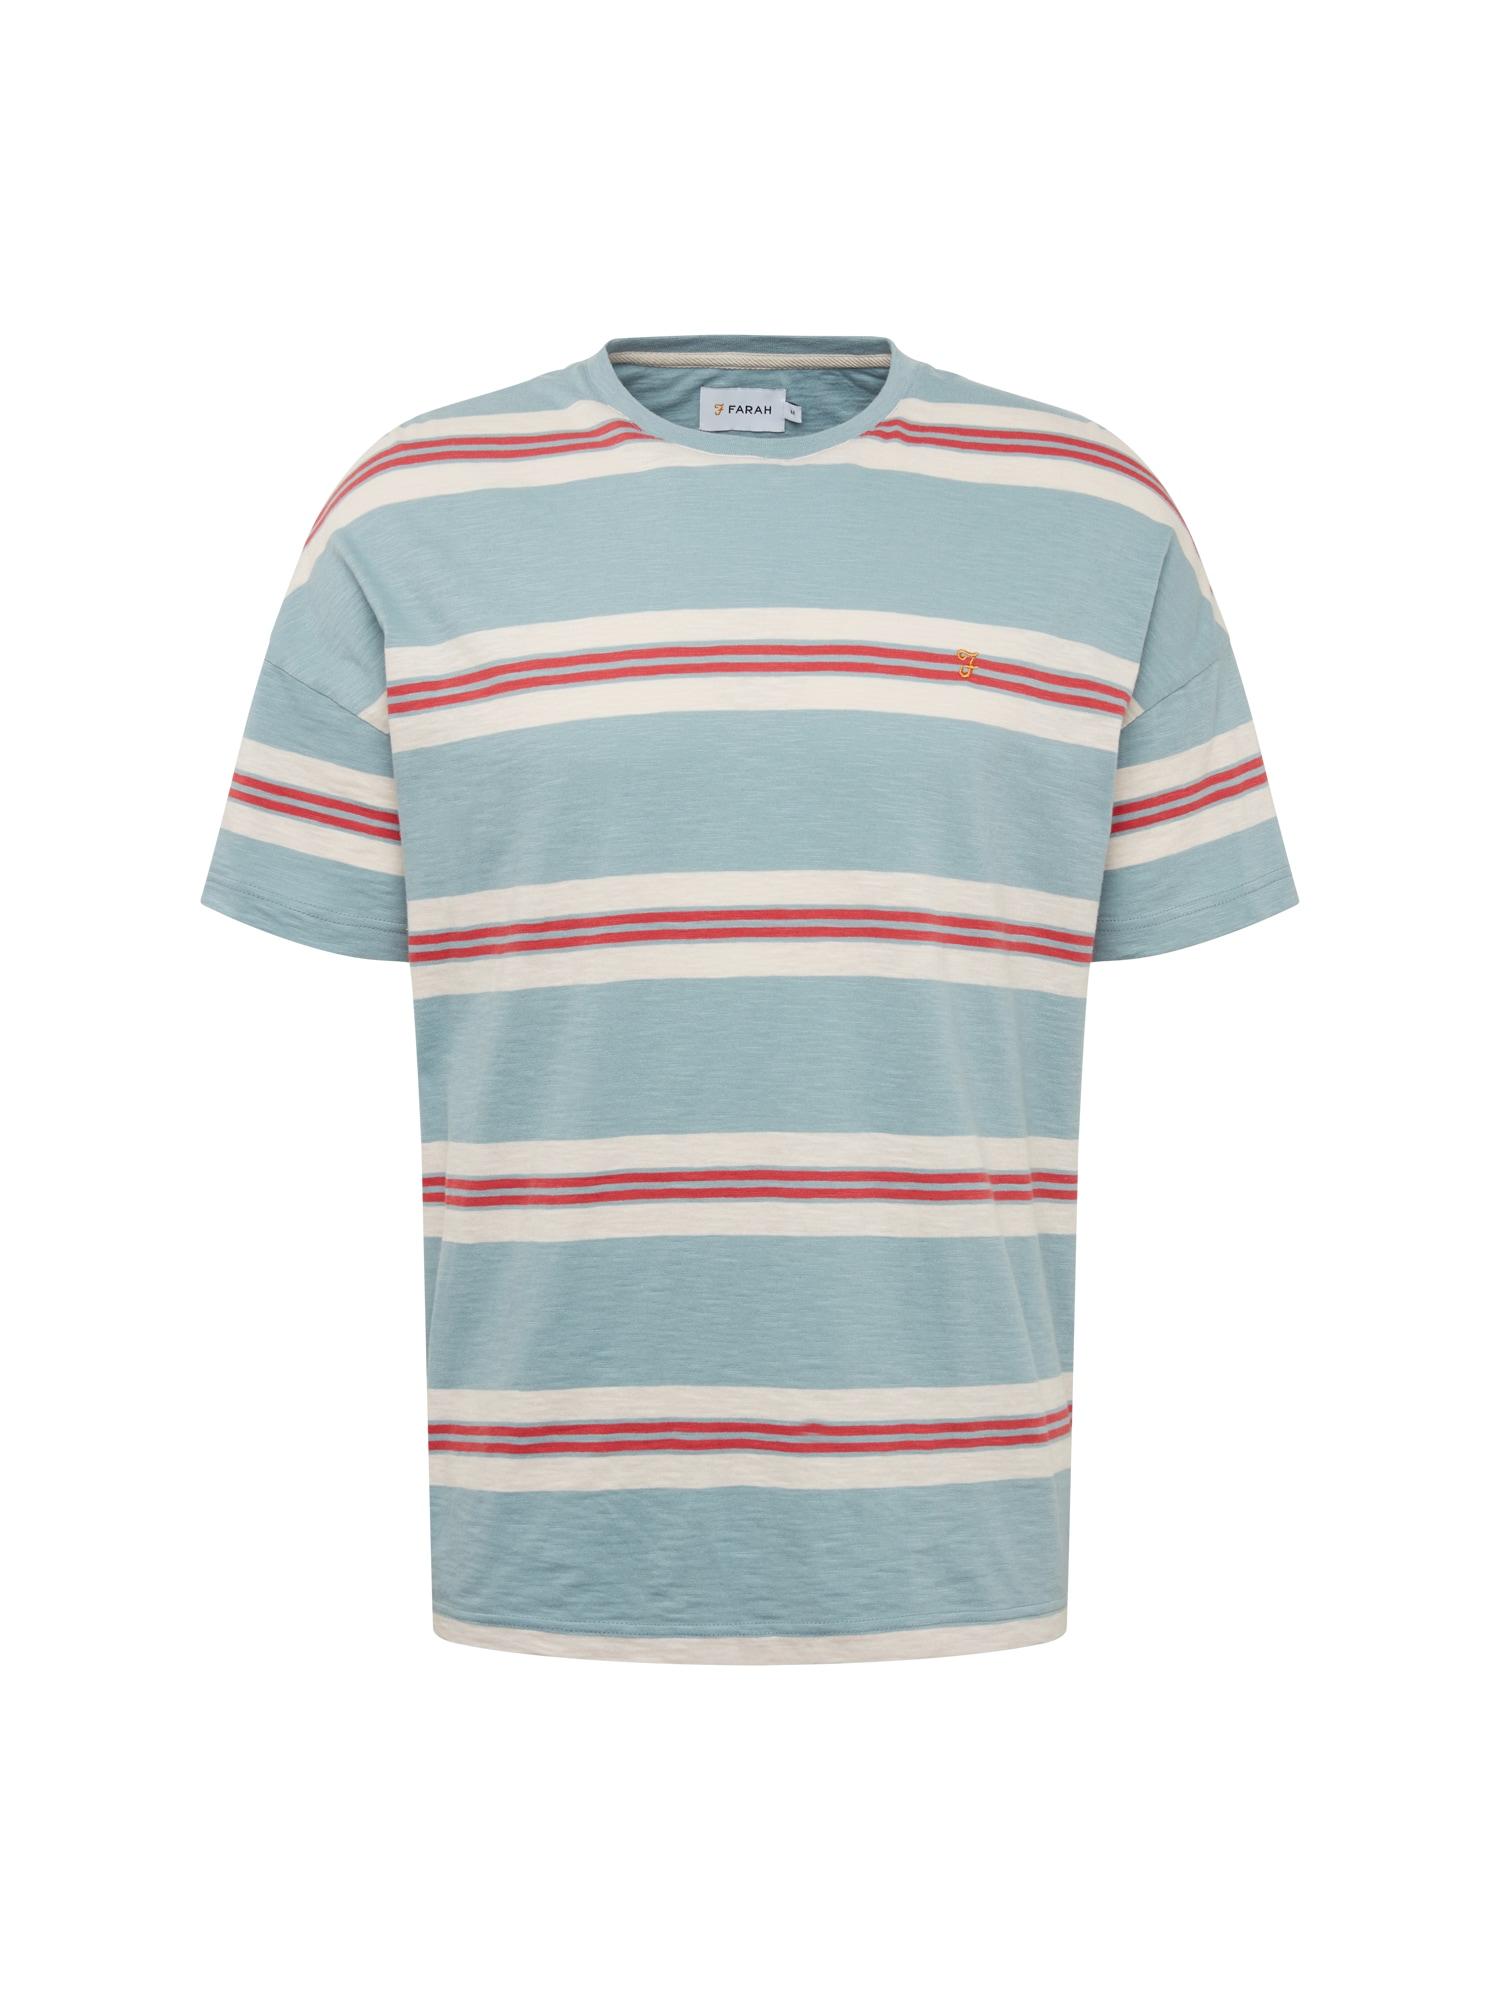 Tričko ELKIN kouřově modrá červená bílá FARAH